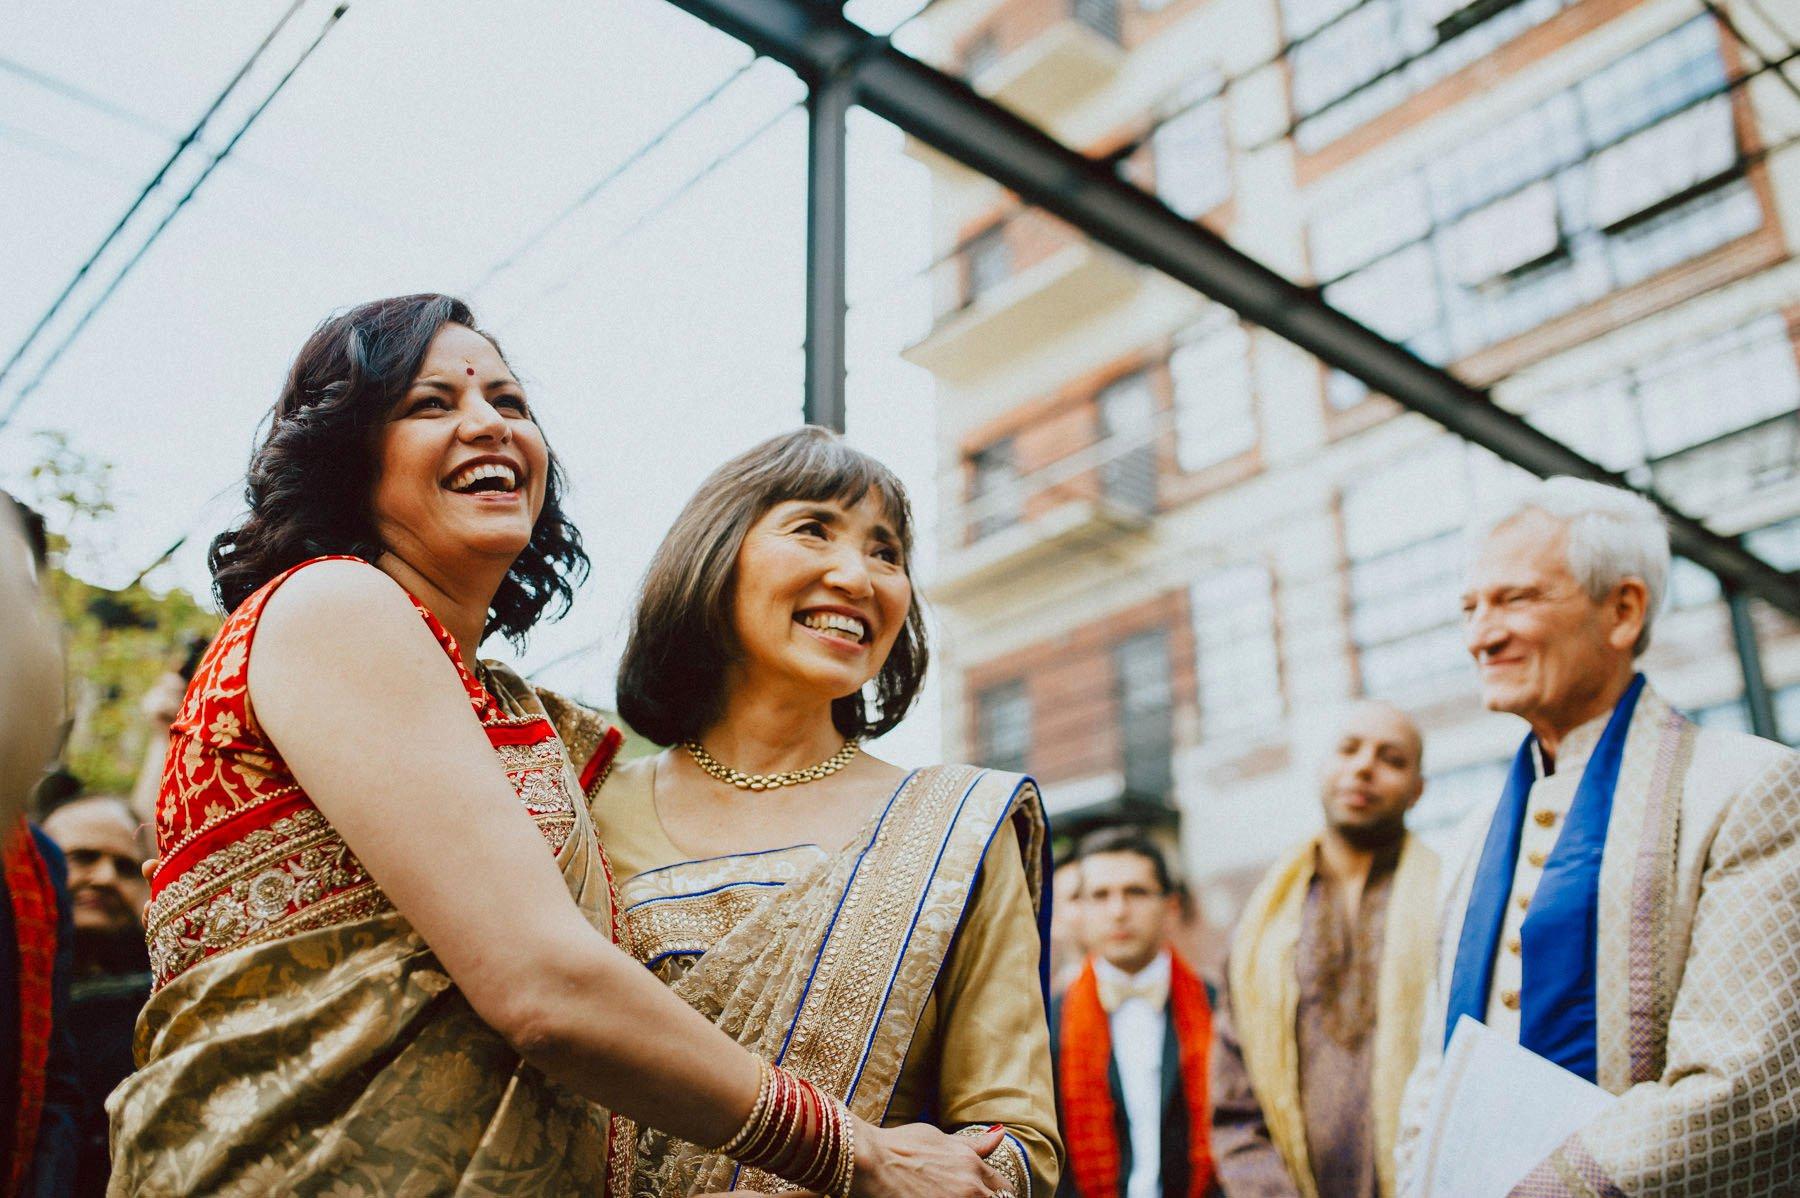 vie-philadelphia-indian-wedding-67.jpg